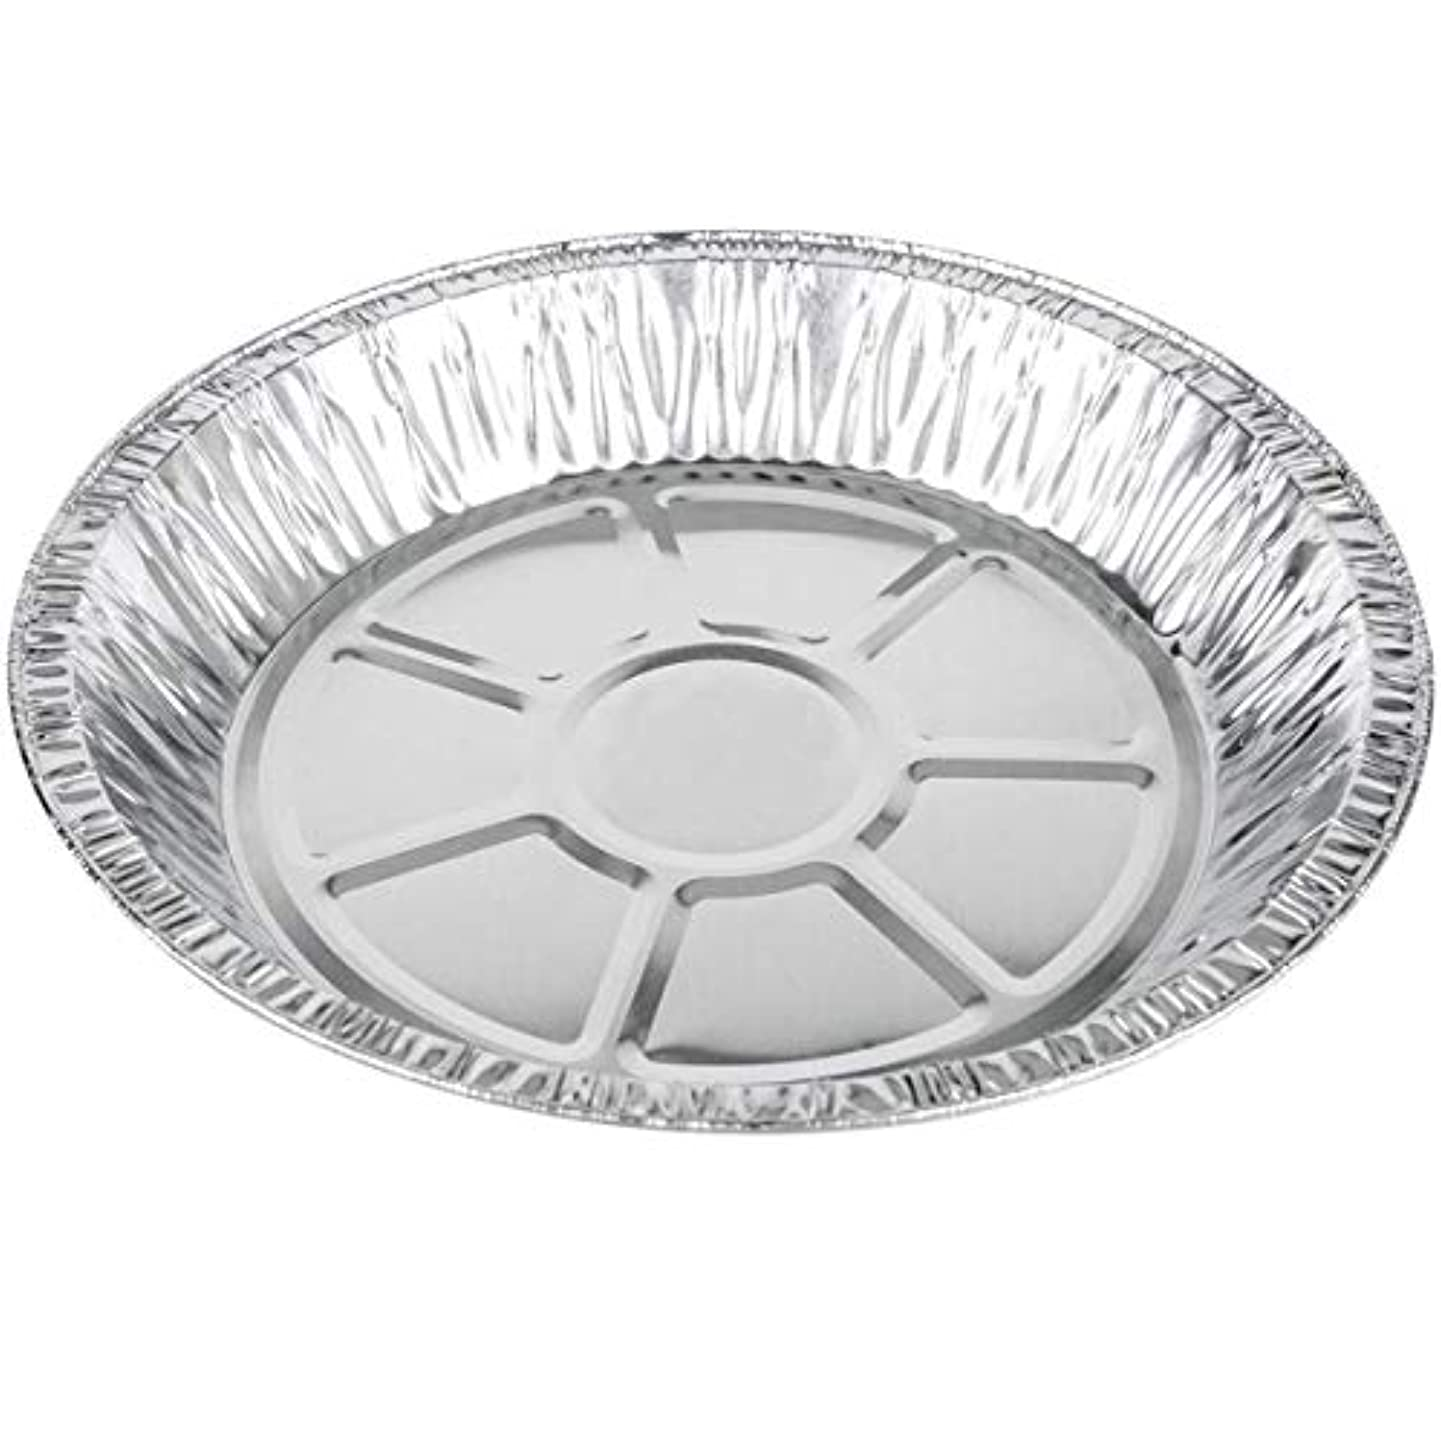 "MM Foodservice Round Aluminum Foil Pie Pan, Disposable Tart Pan, 25 Pack (9"" x 1 3/16"" Extra Deep)"